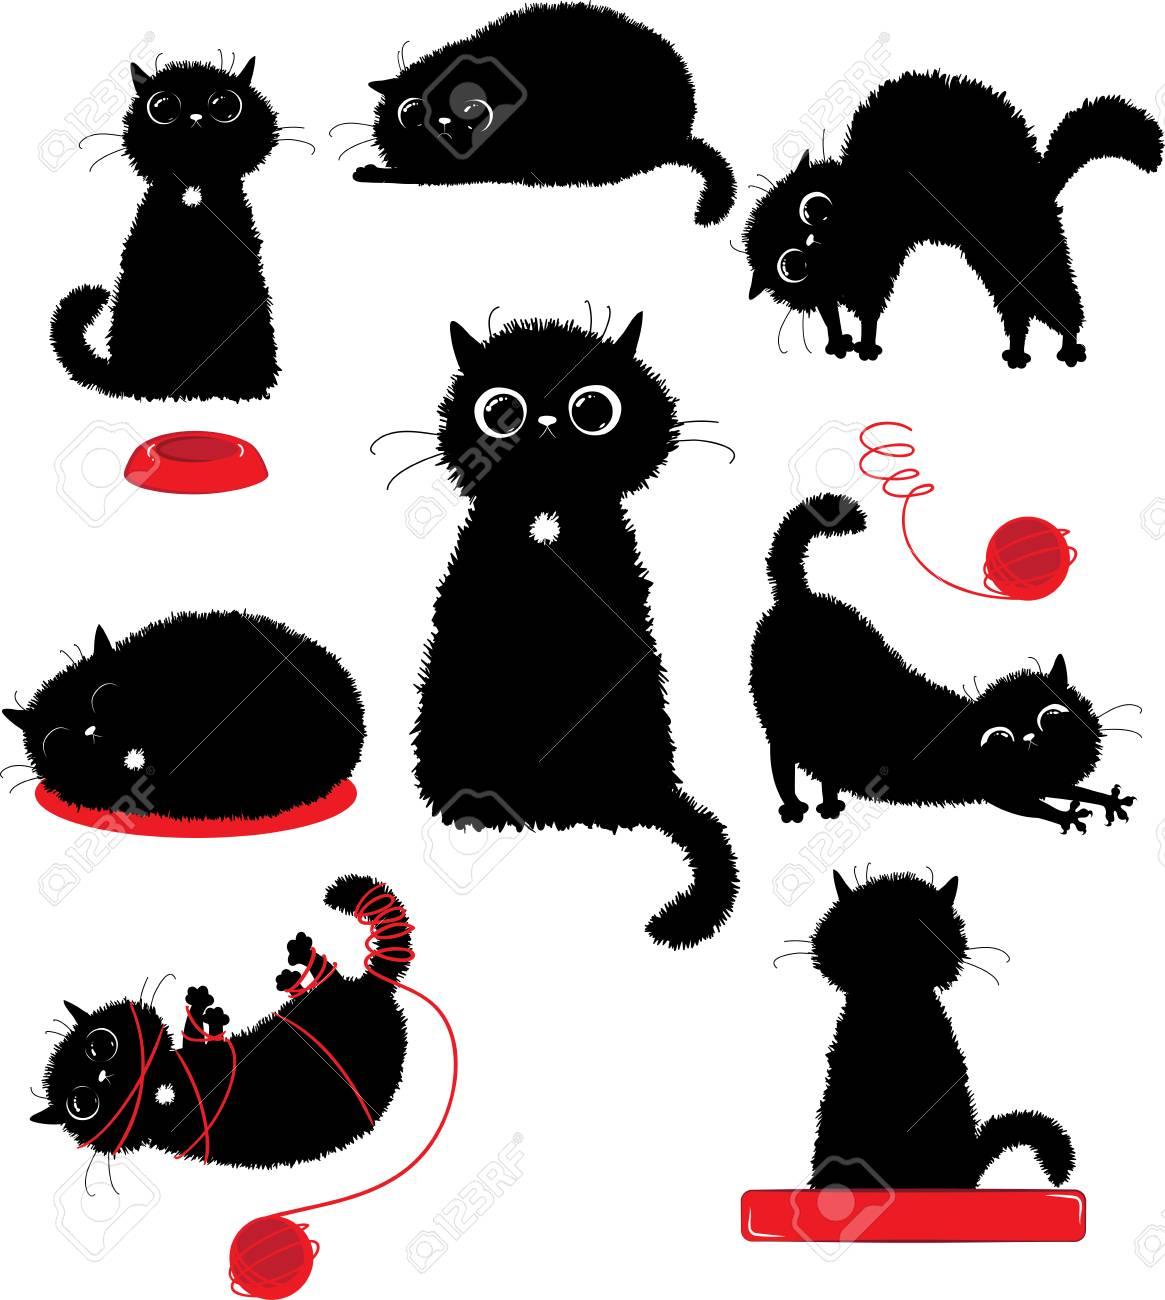 Black kitty playing - 83683598